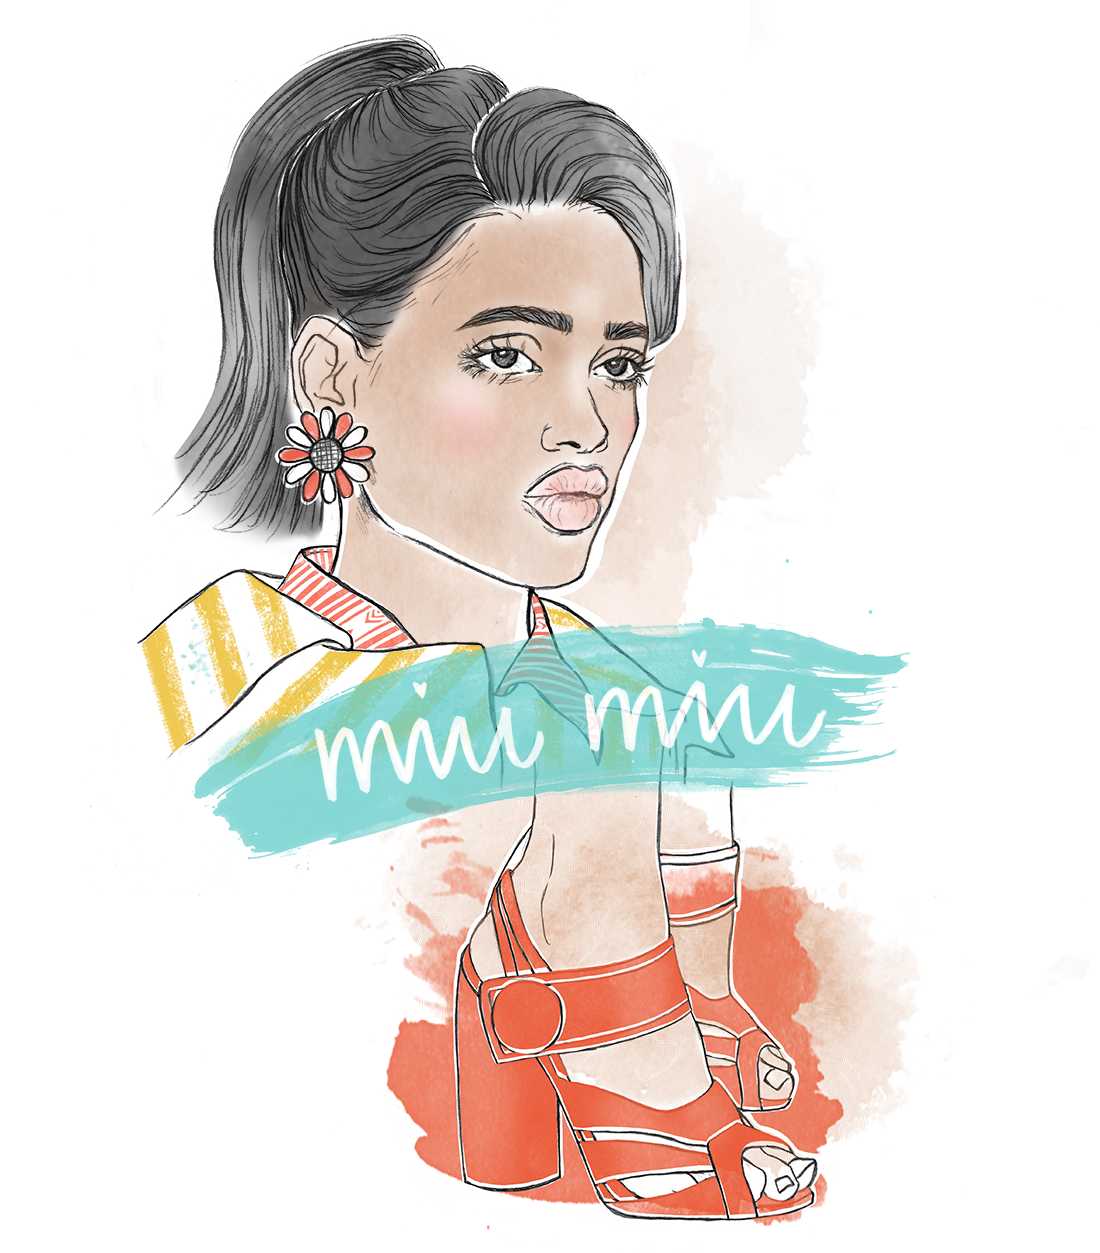 Graphite drawing, digital colouring    Inspired by Miu Miu Fall 2015